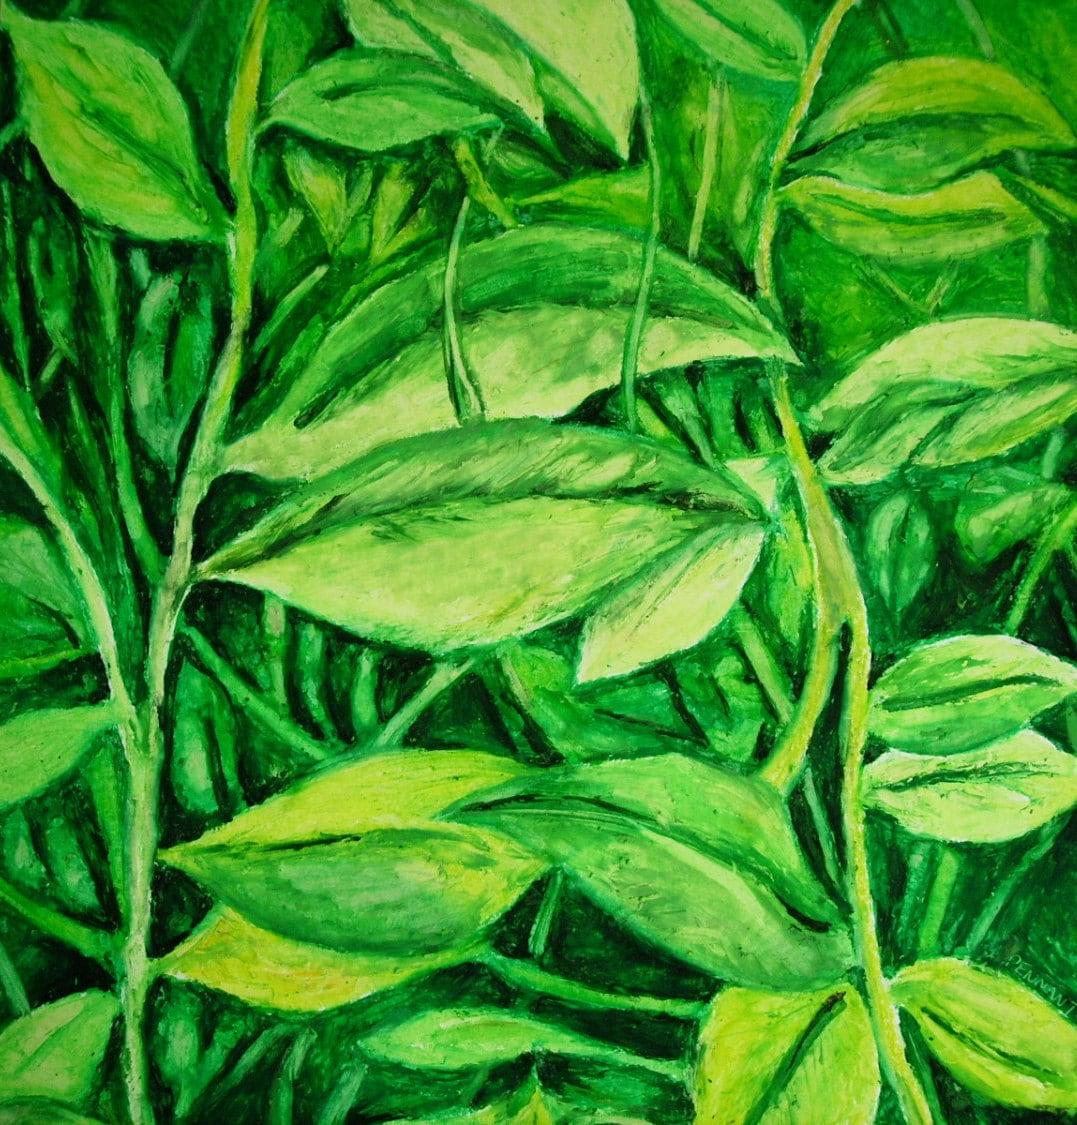 for t de plantes feuilles vertes 14 x 17 original huile. Black Bedroom Furniture Sets. Home Design Ideas